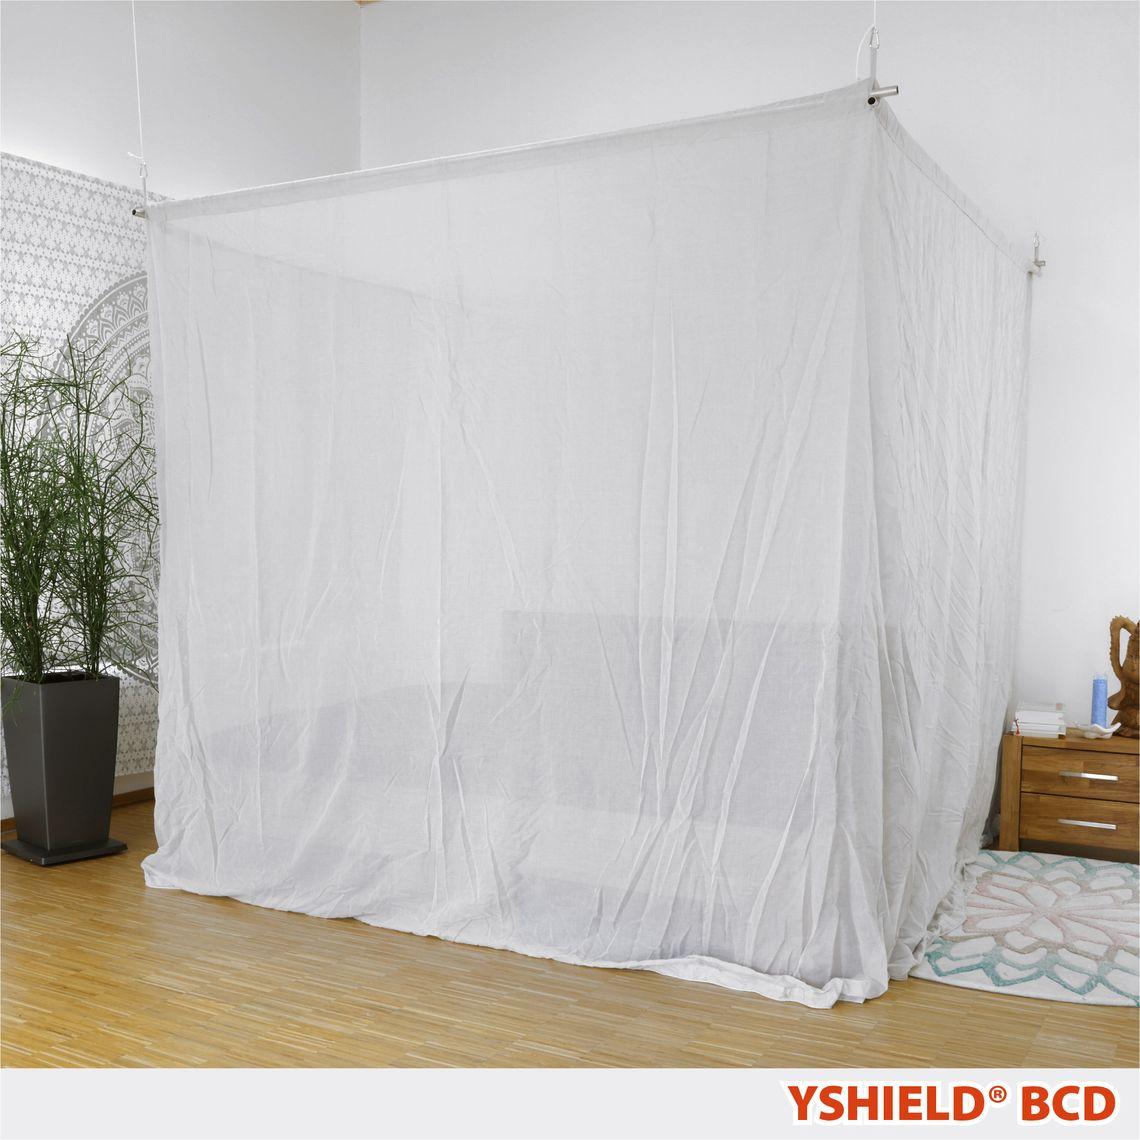 YSHIELD® BCD | Abschirmbaldachin | Doppelbett | SILVER-COTTON | Miete 14 Tage